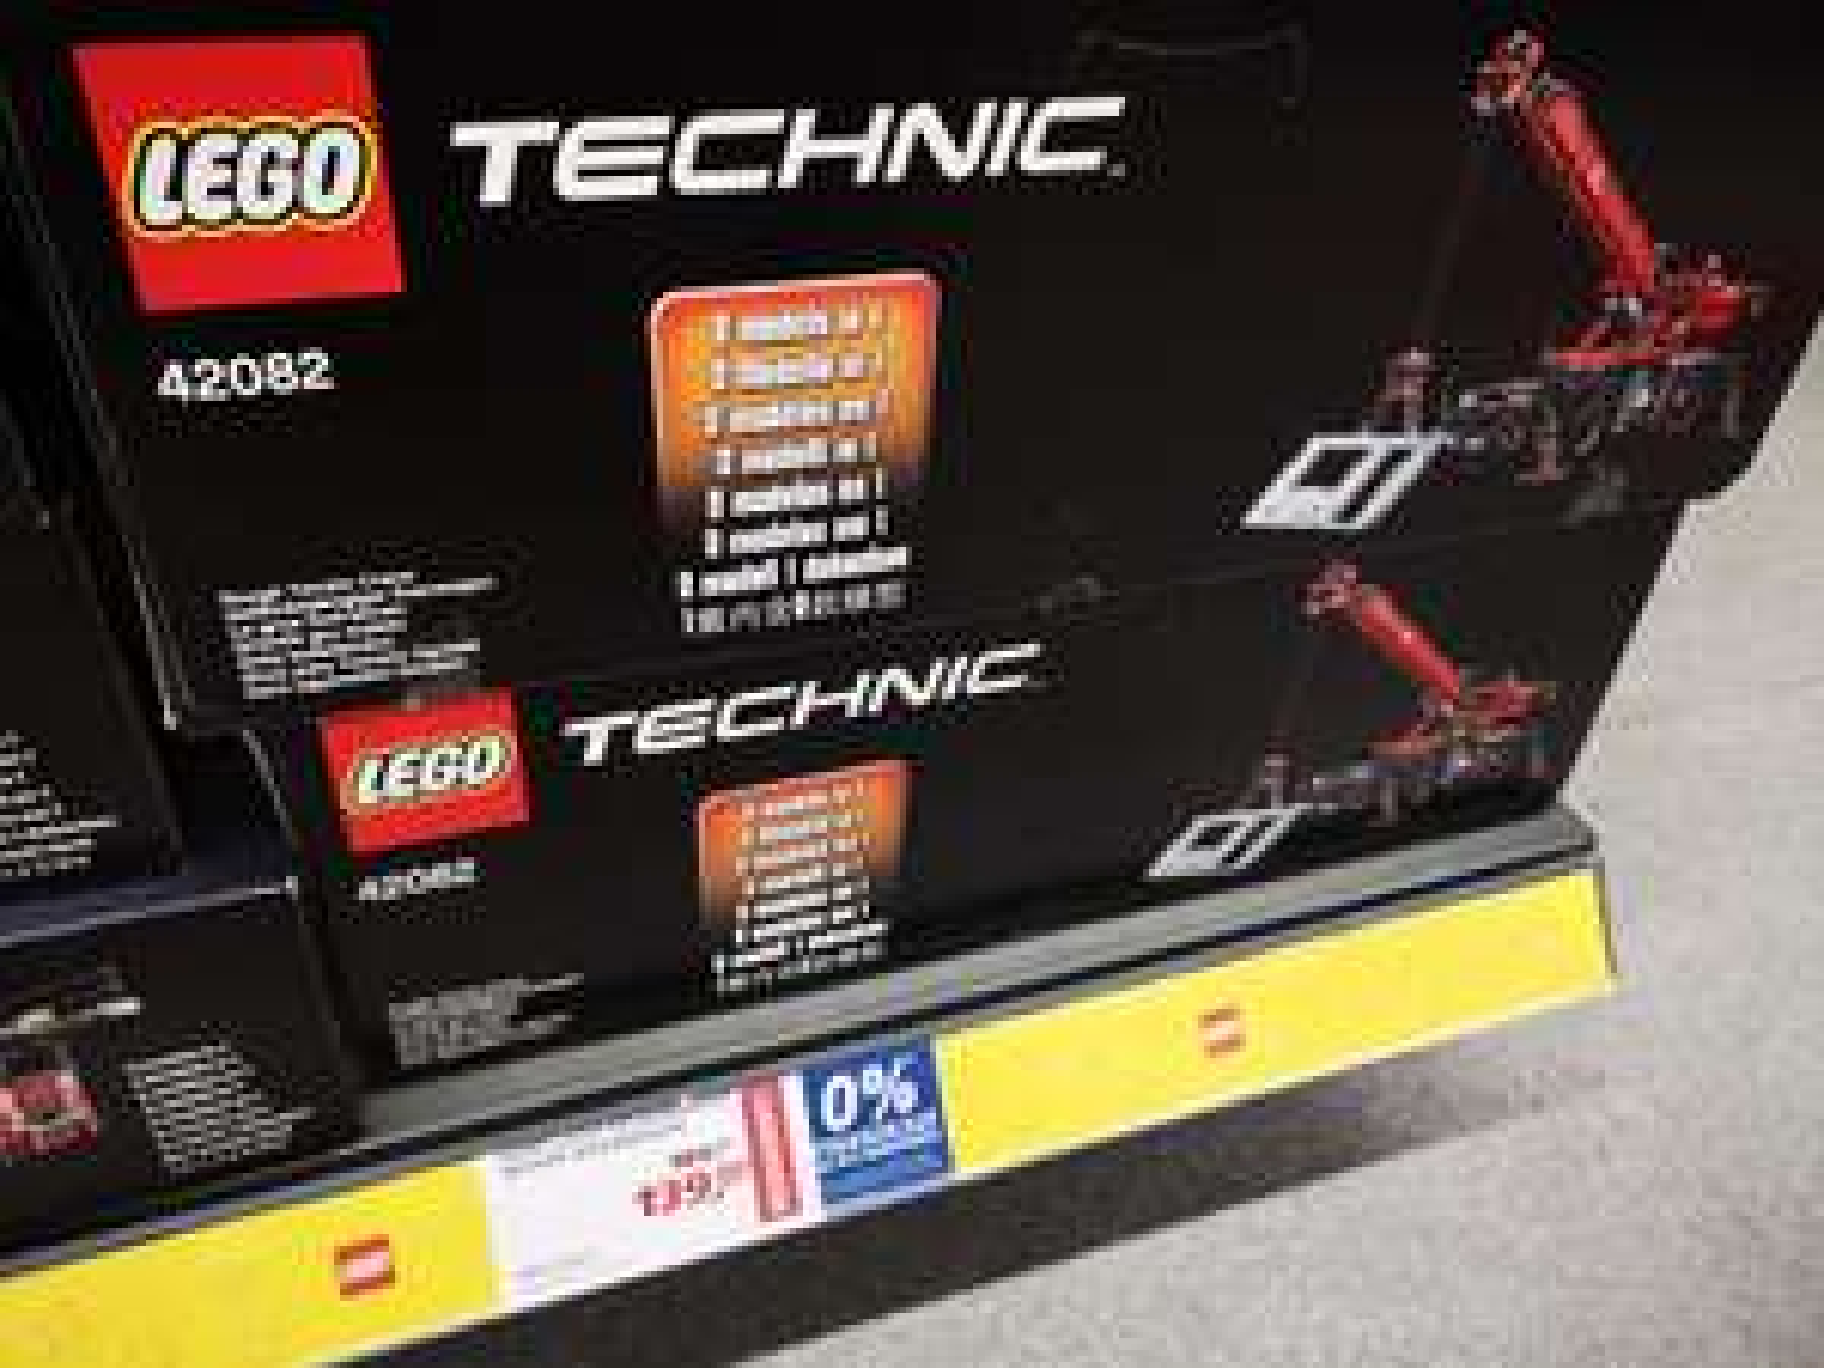 (Lokal) Bielefeld Brackwede bei Real - Lego Geländegängiger Kranwagen 42082